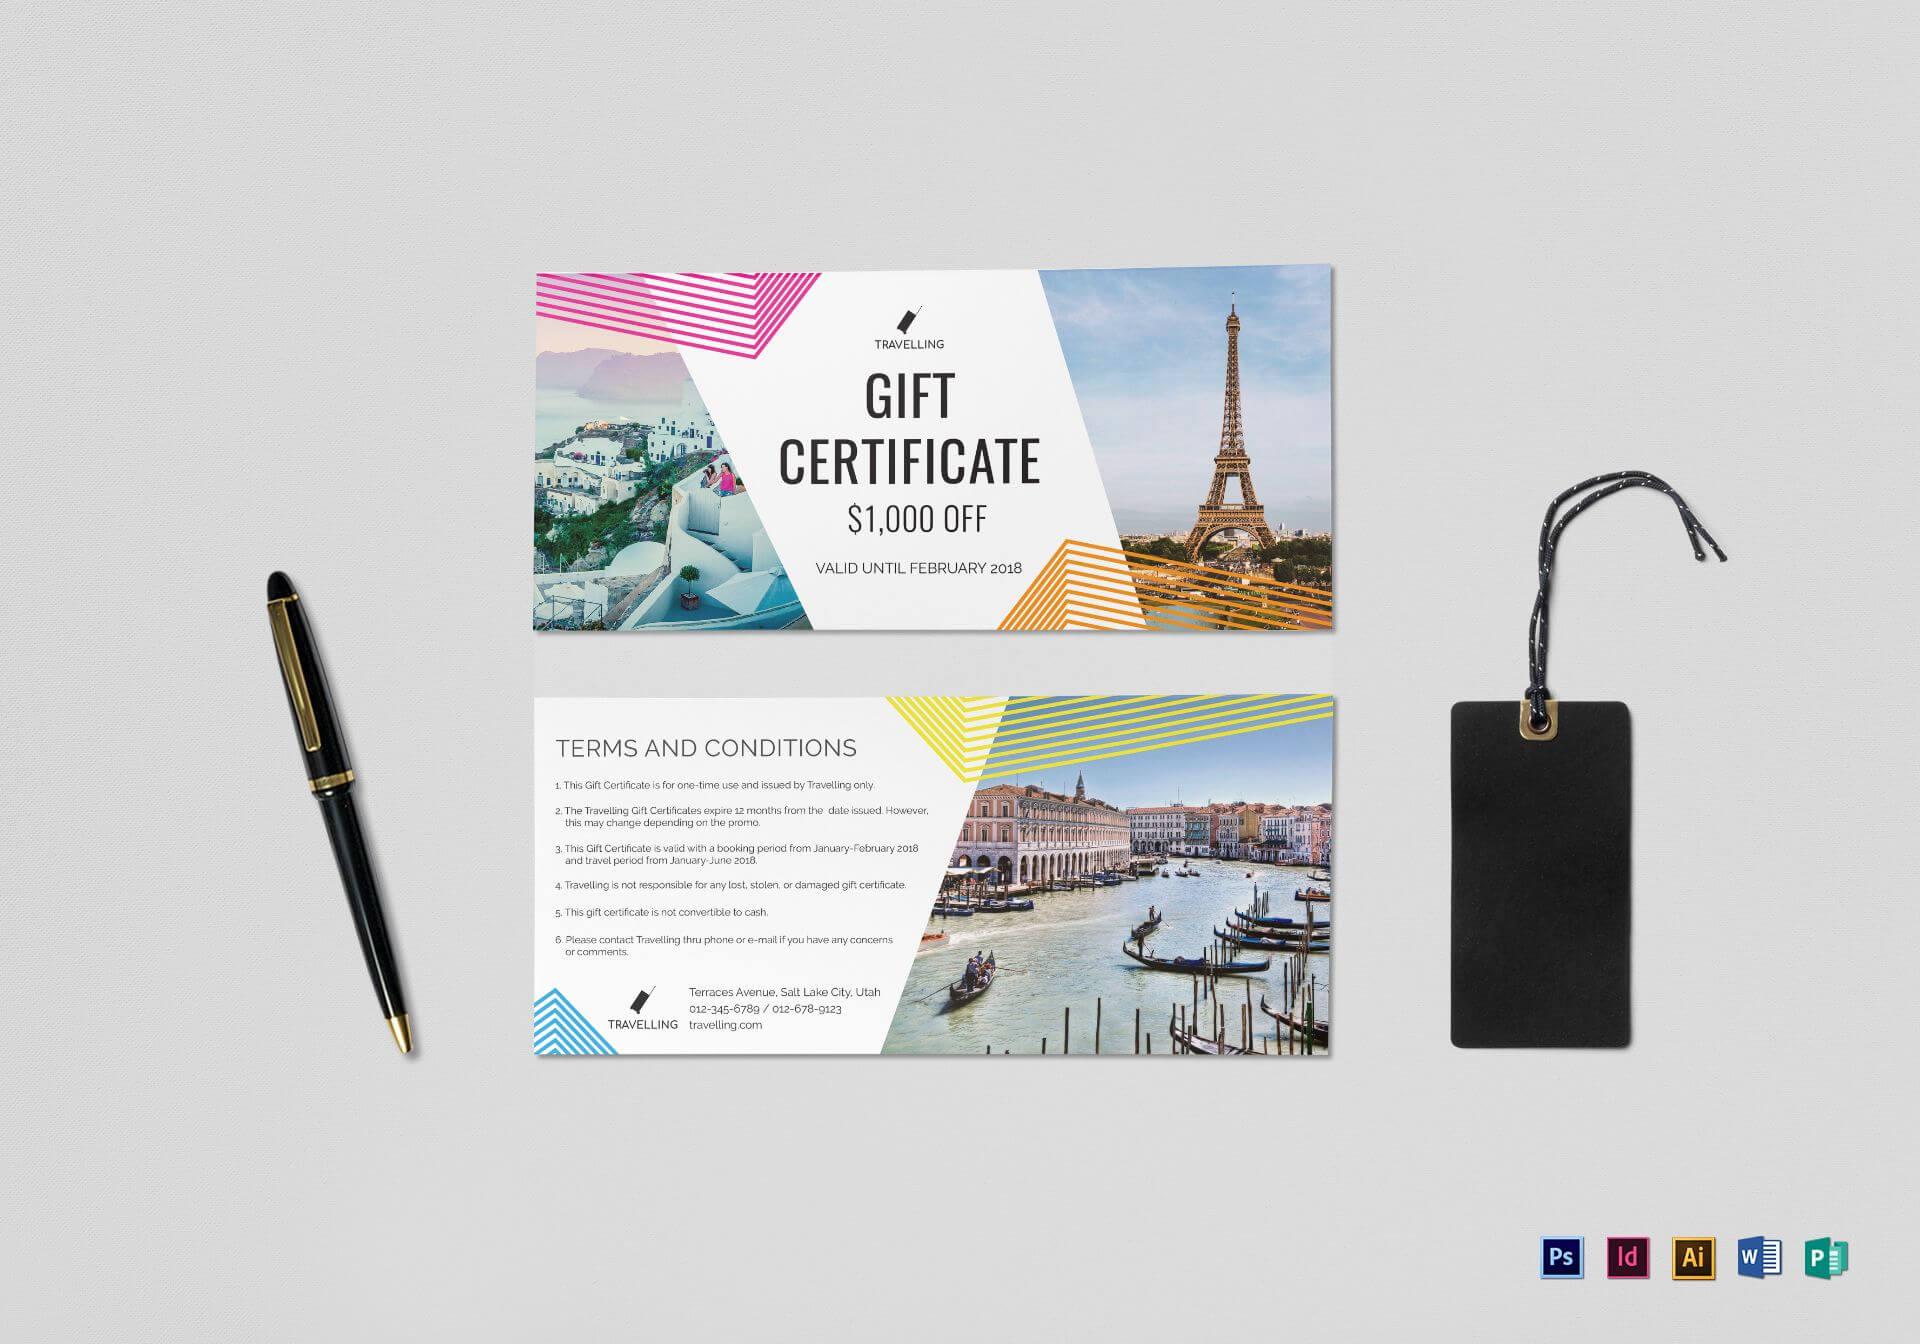 Travel Gift Certificate Template Regarding Gift Certificate Template Indesign